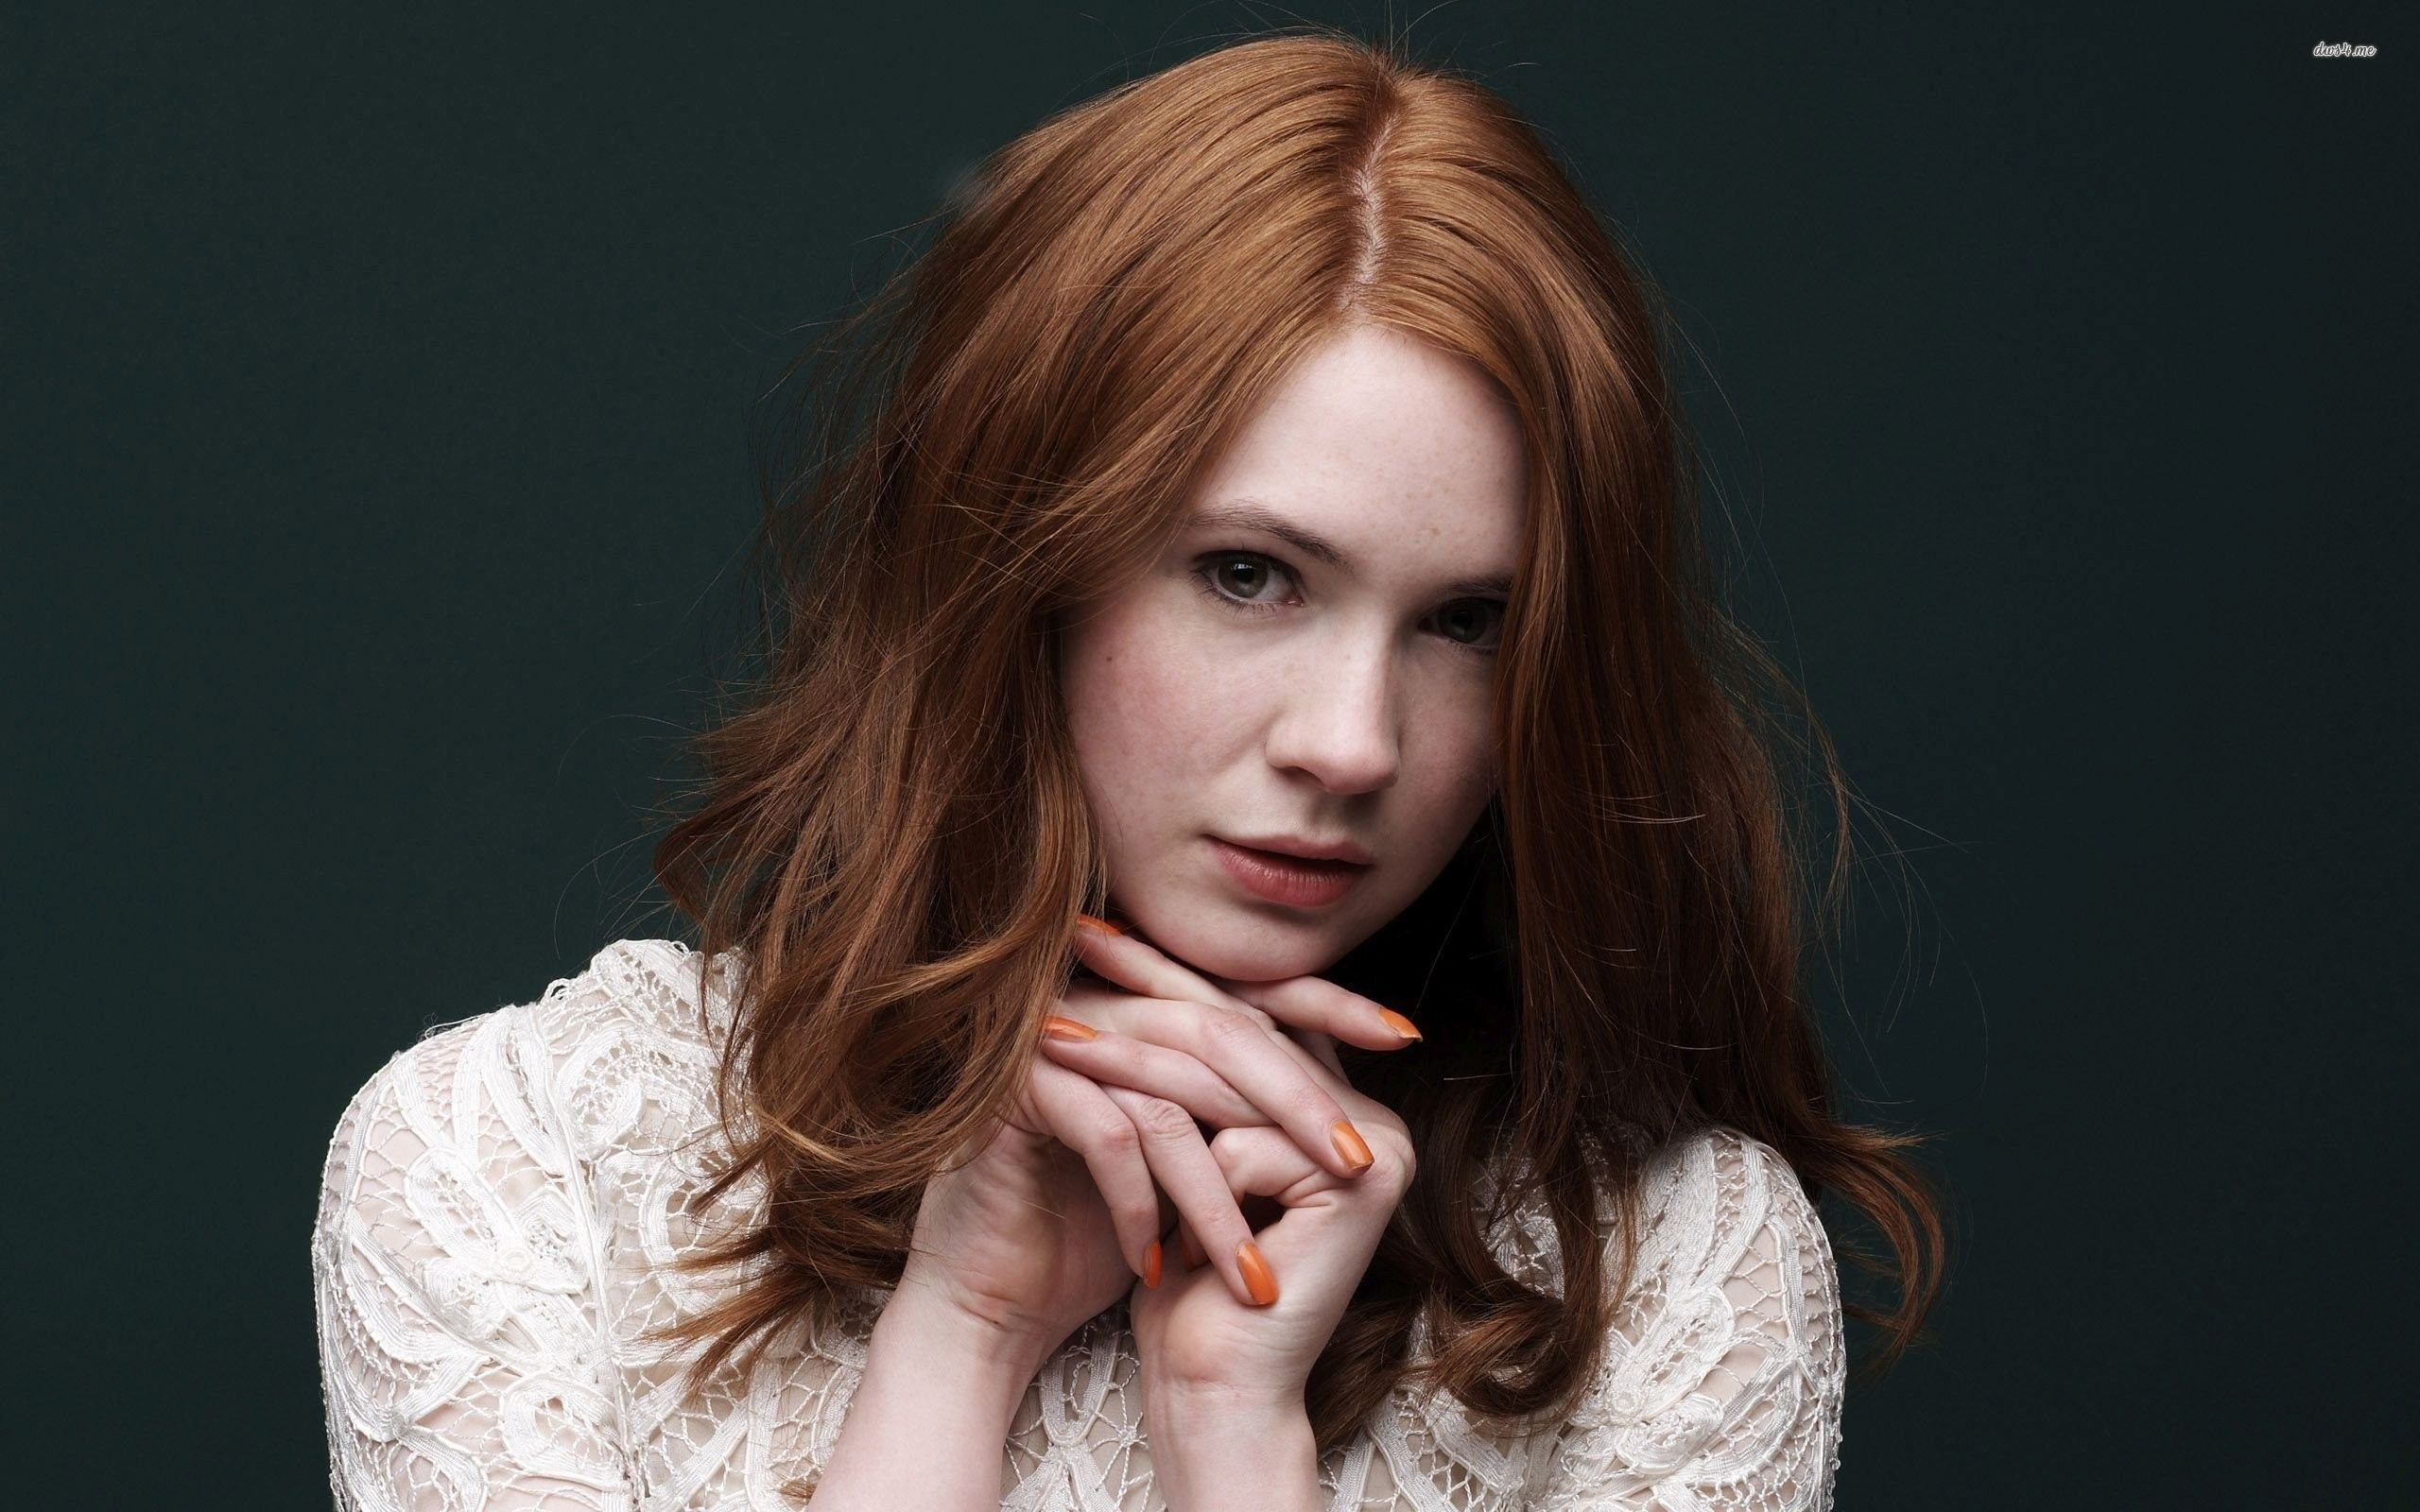 Singer actress redhead